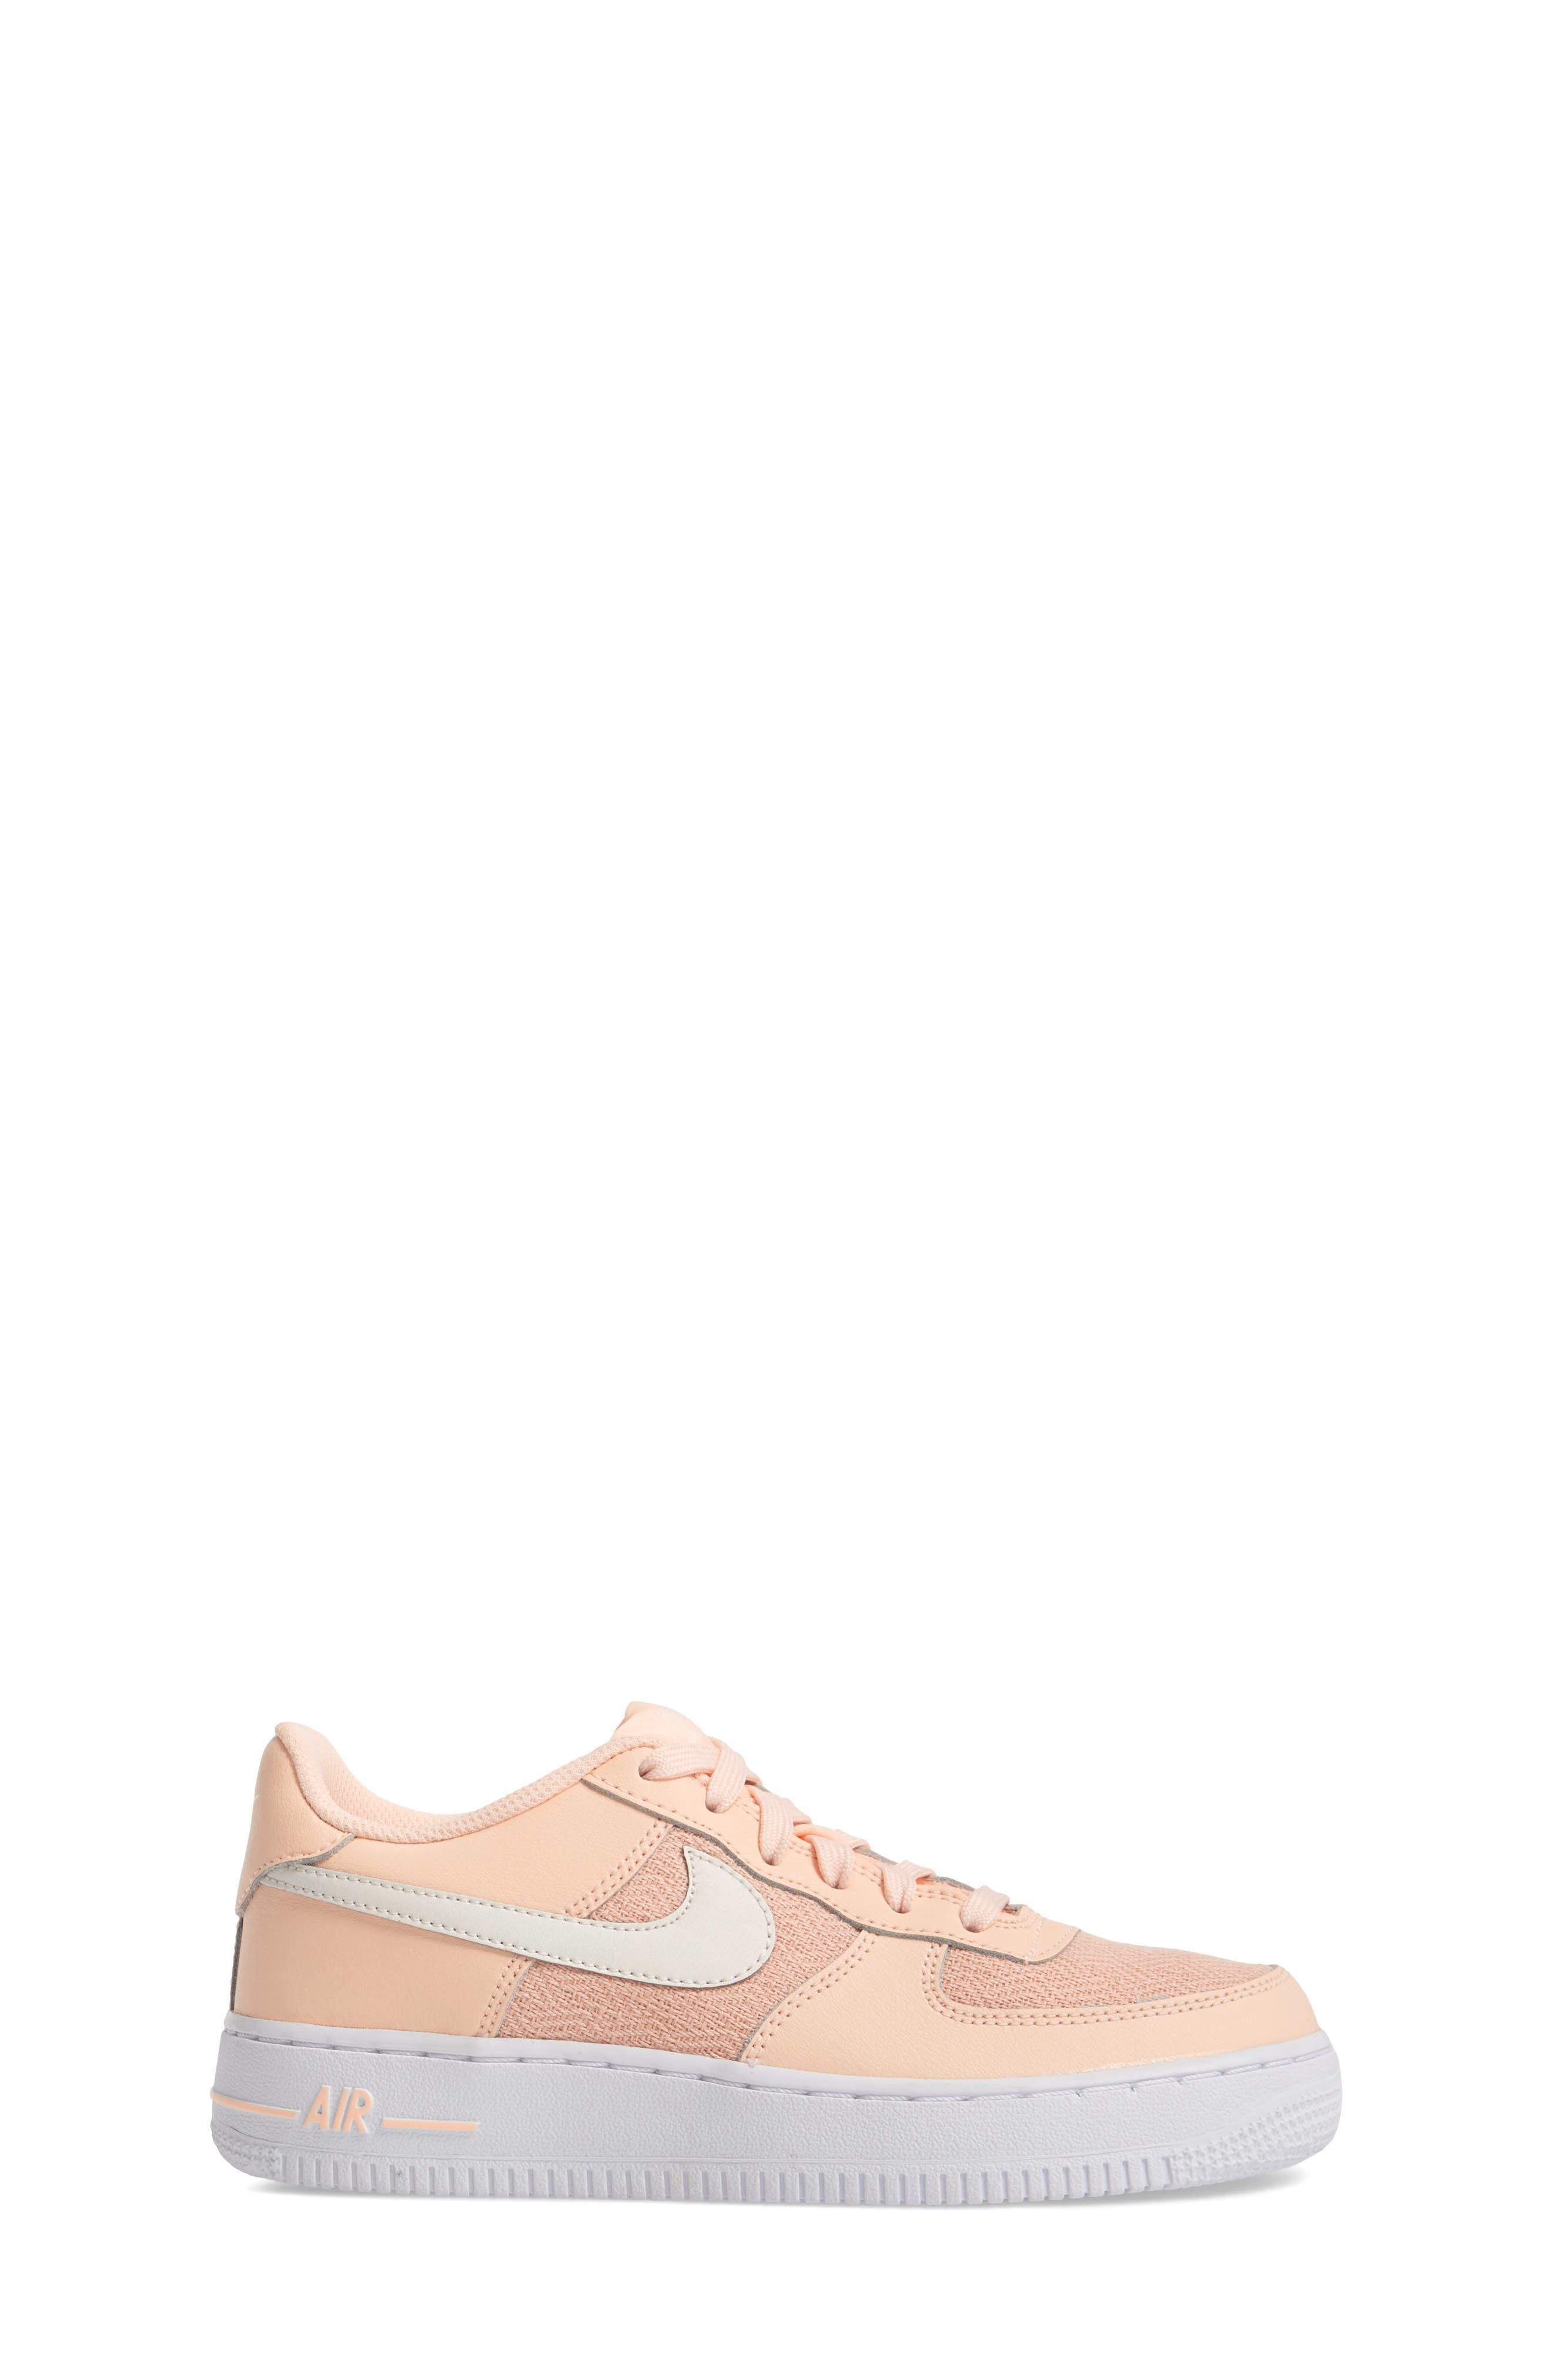 Air Force 1 LV8 Sneaker,                             Alternate thumbnail 13, color,